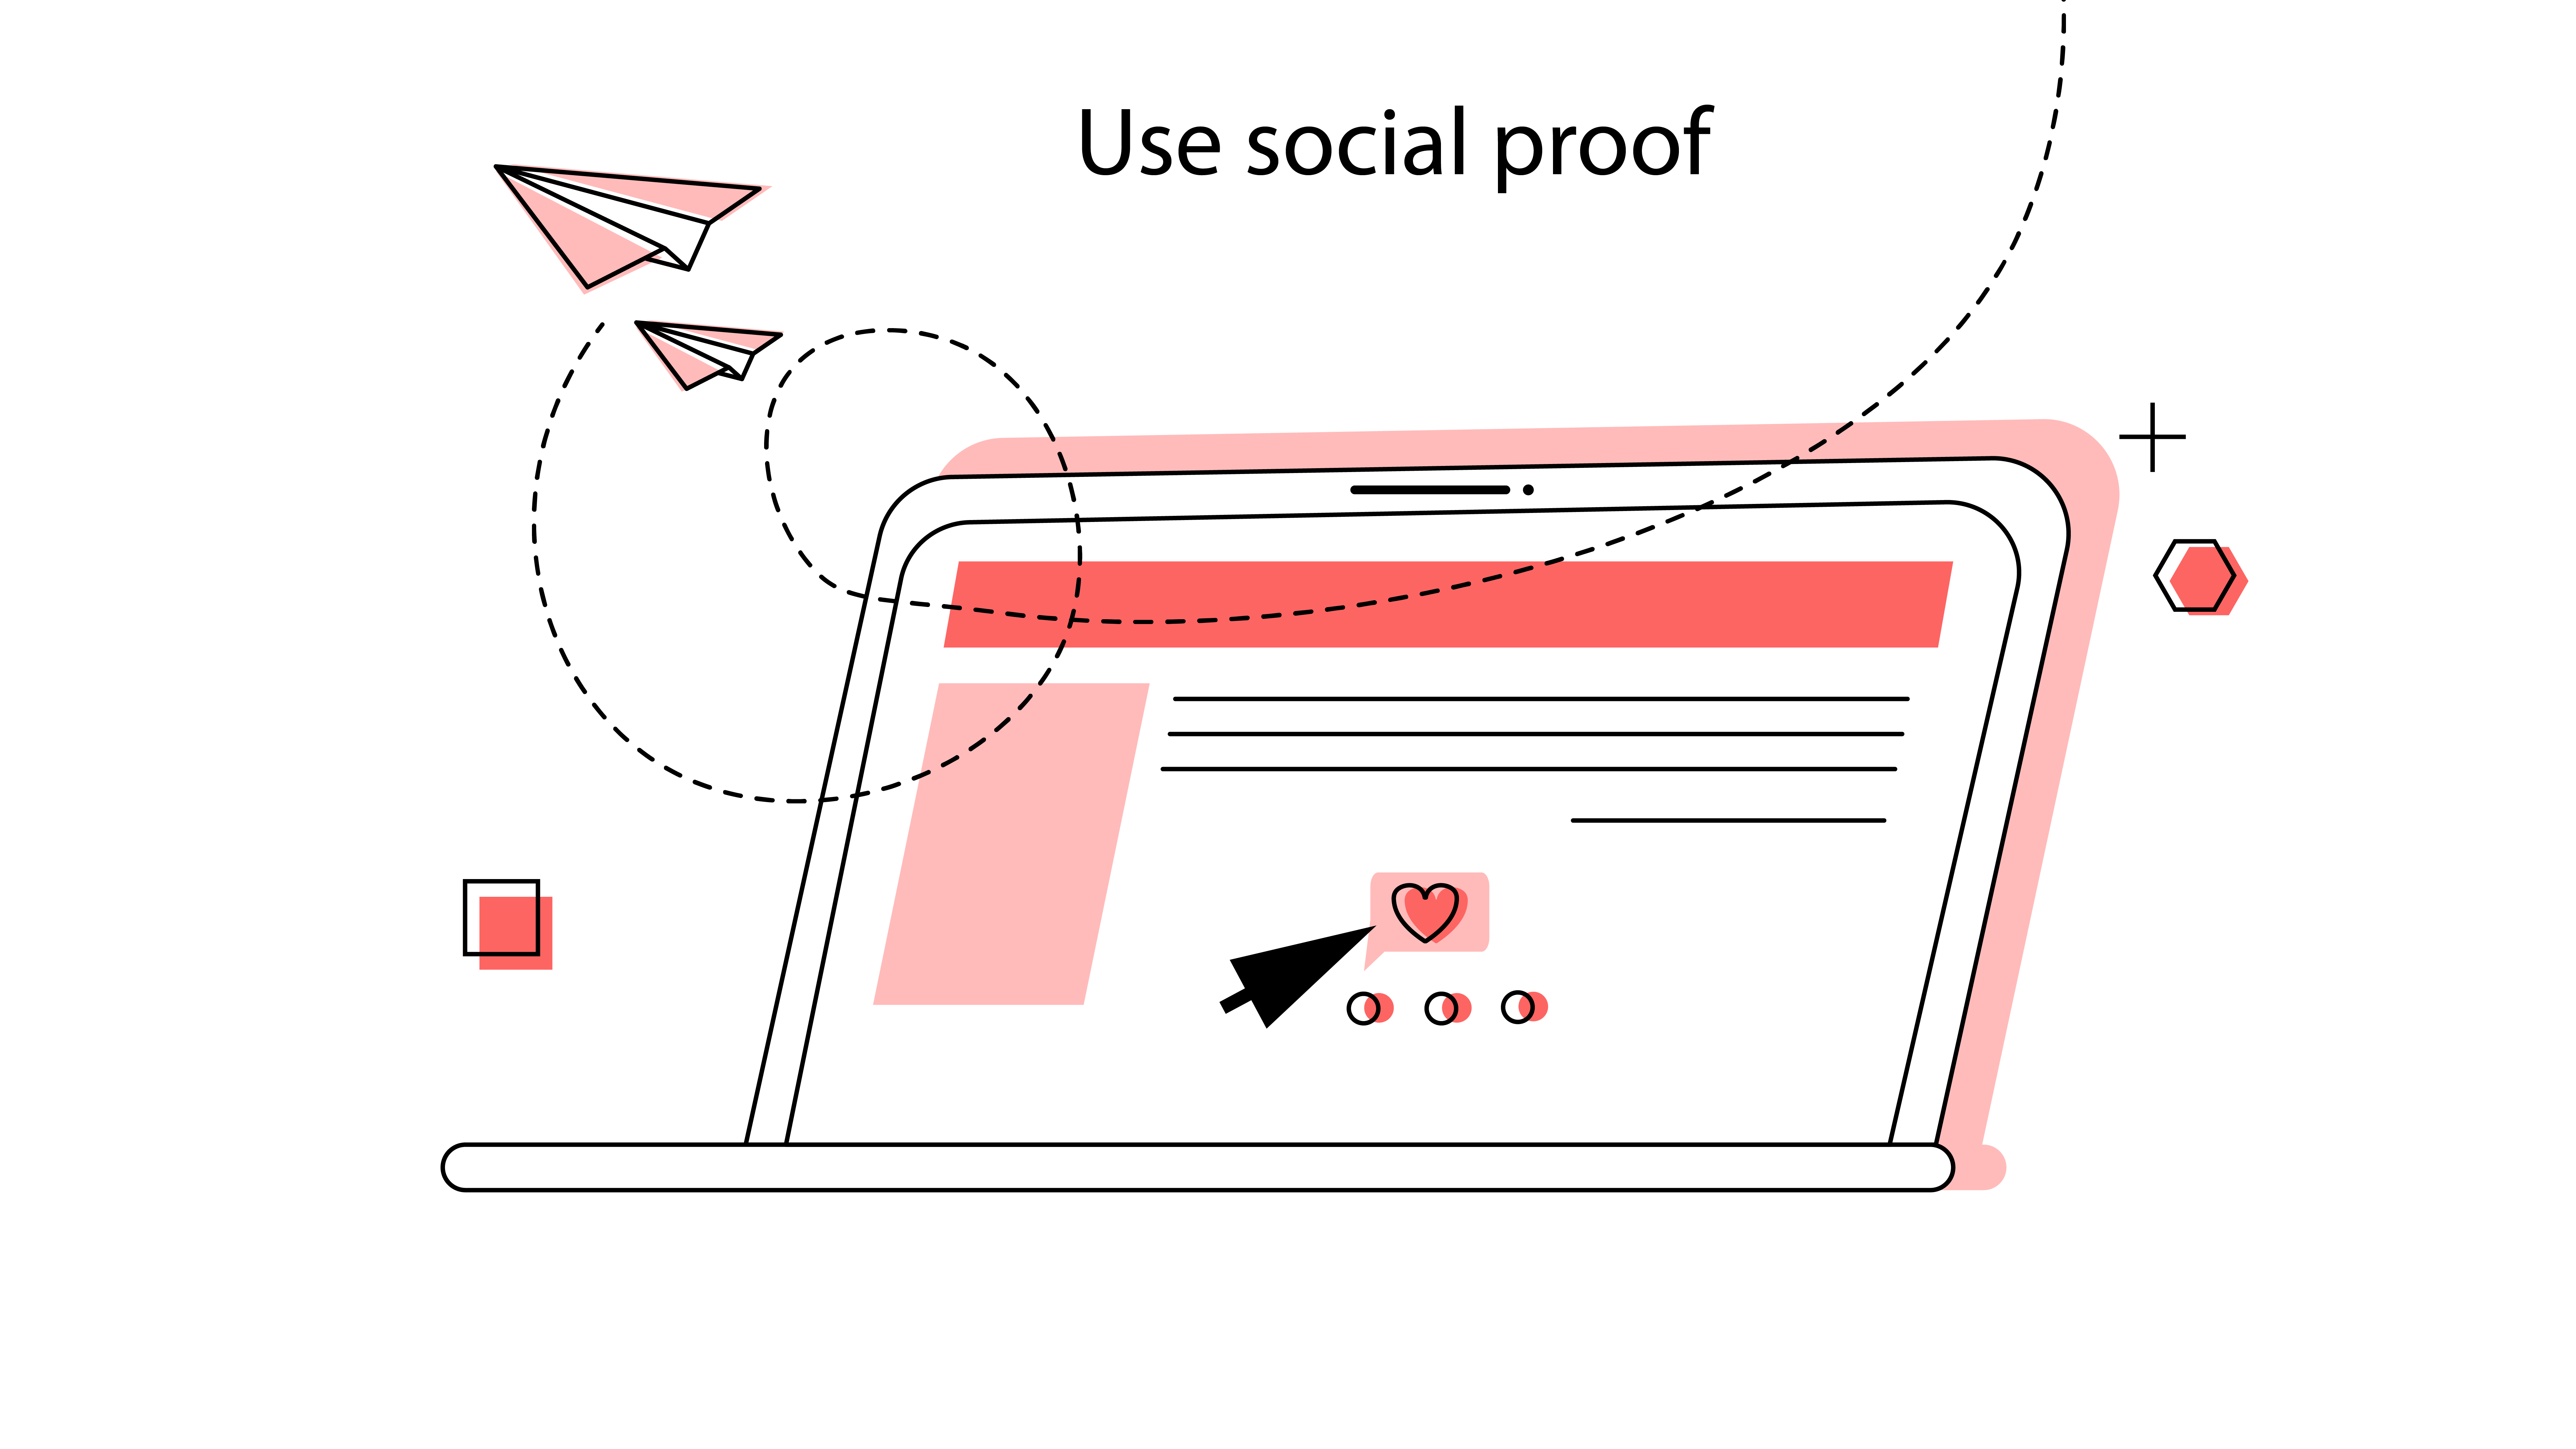 social proofs will make a web design improvement